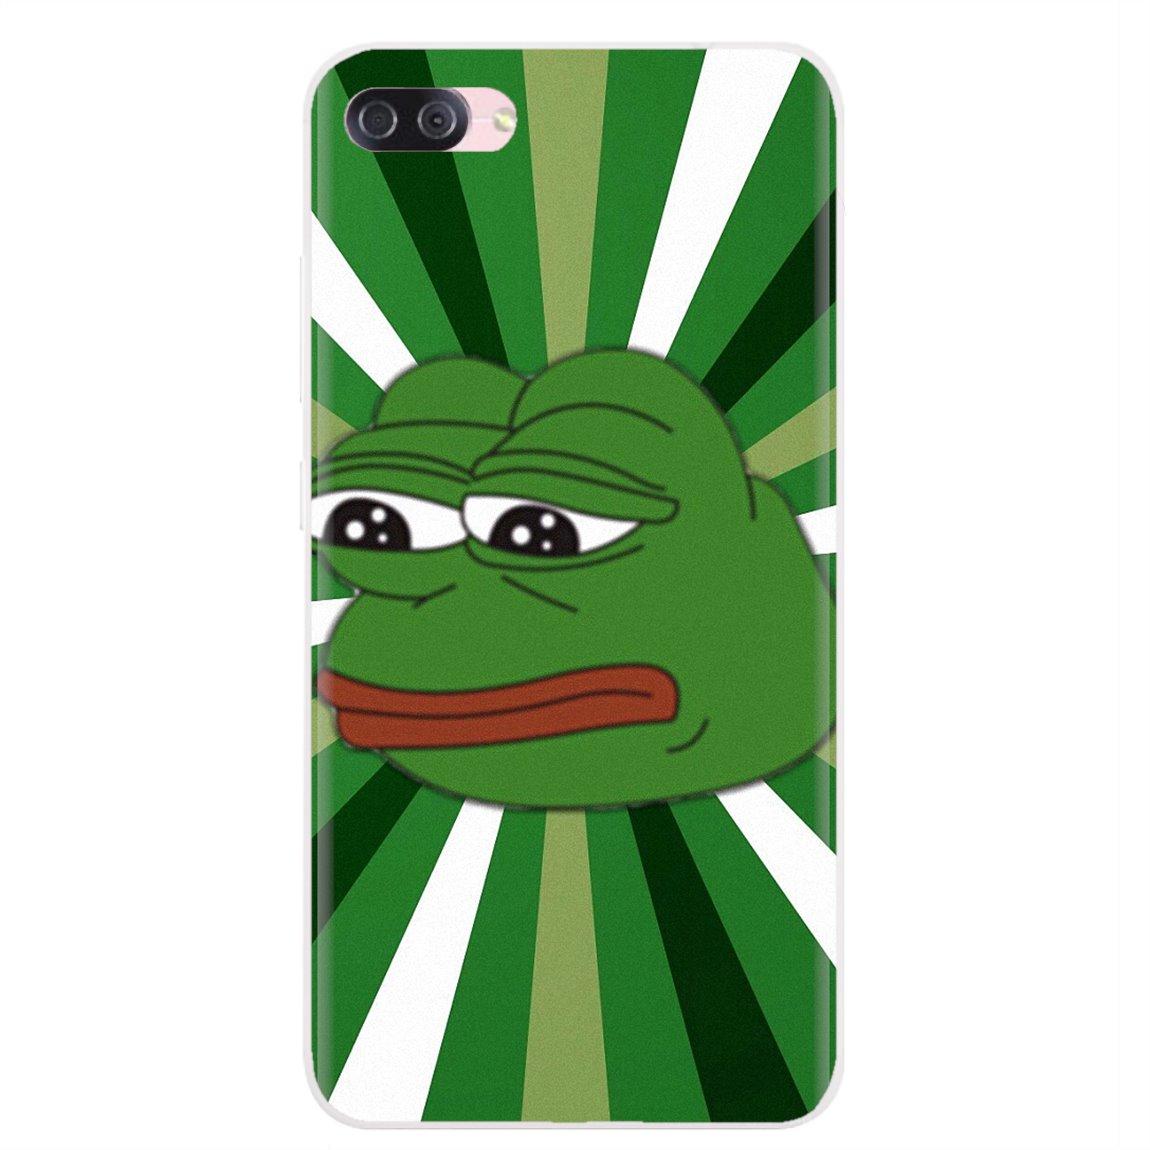 Yuri no gelo sapo meme pepe pubg para xiaomi mi a1 a2 a3 5x 6x 8 9t lite se pro mi max mix 1 2 3 2s favorito silicone caso de telefone